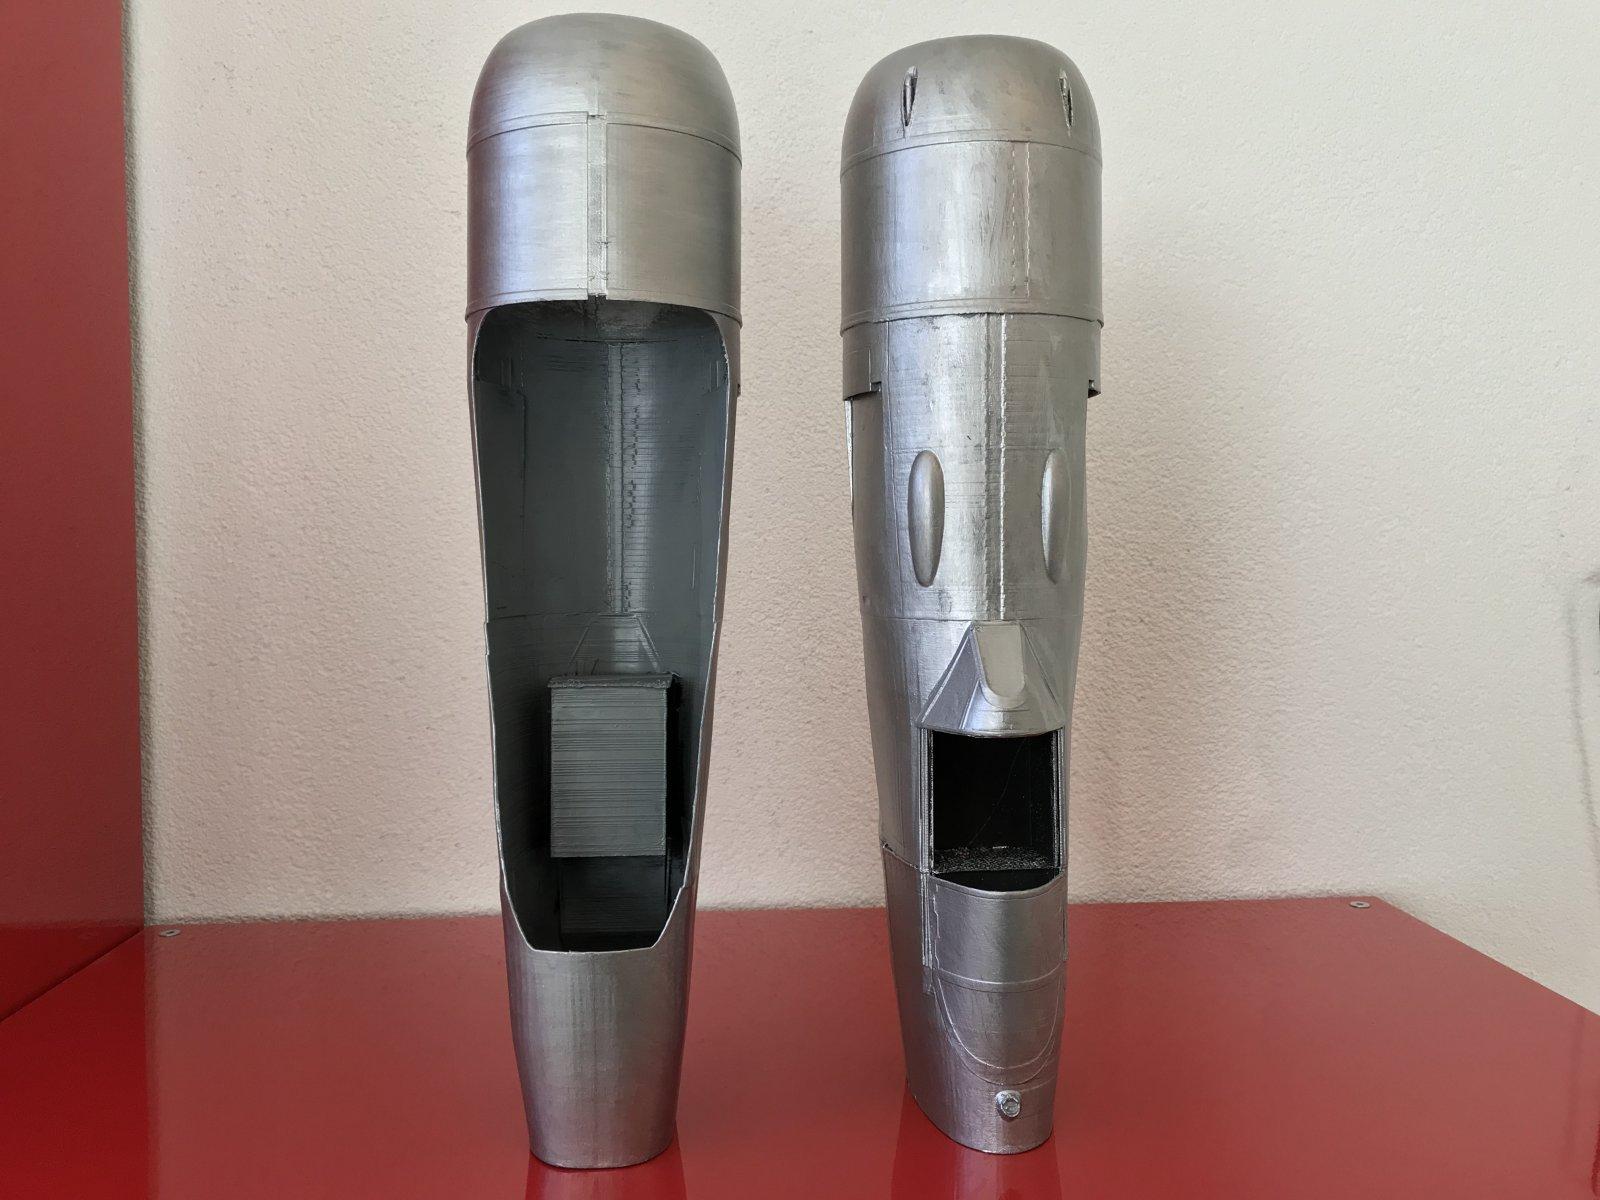 07C5024E-DB2F-4A64-BF22-711697538A1A.jpeg